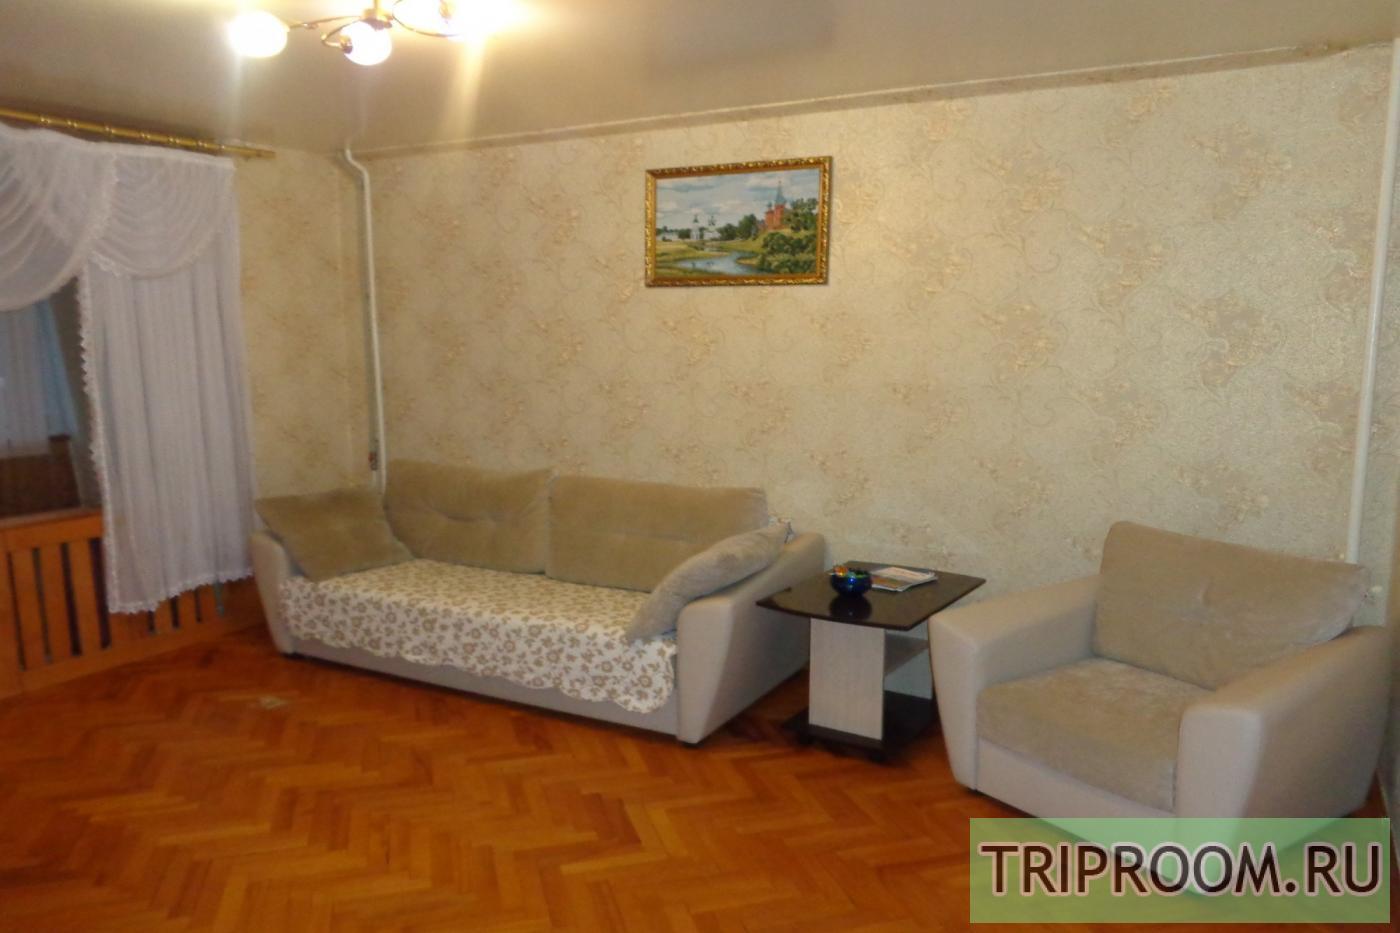 2-комнатная квартира посуточно (вариант № 5525), ул. 60 лет ВЛКСМ улица, фото № 3